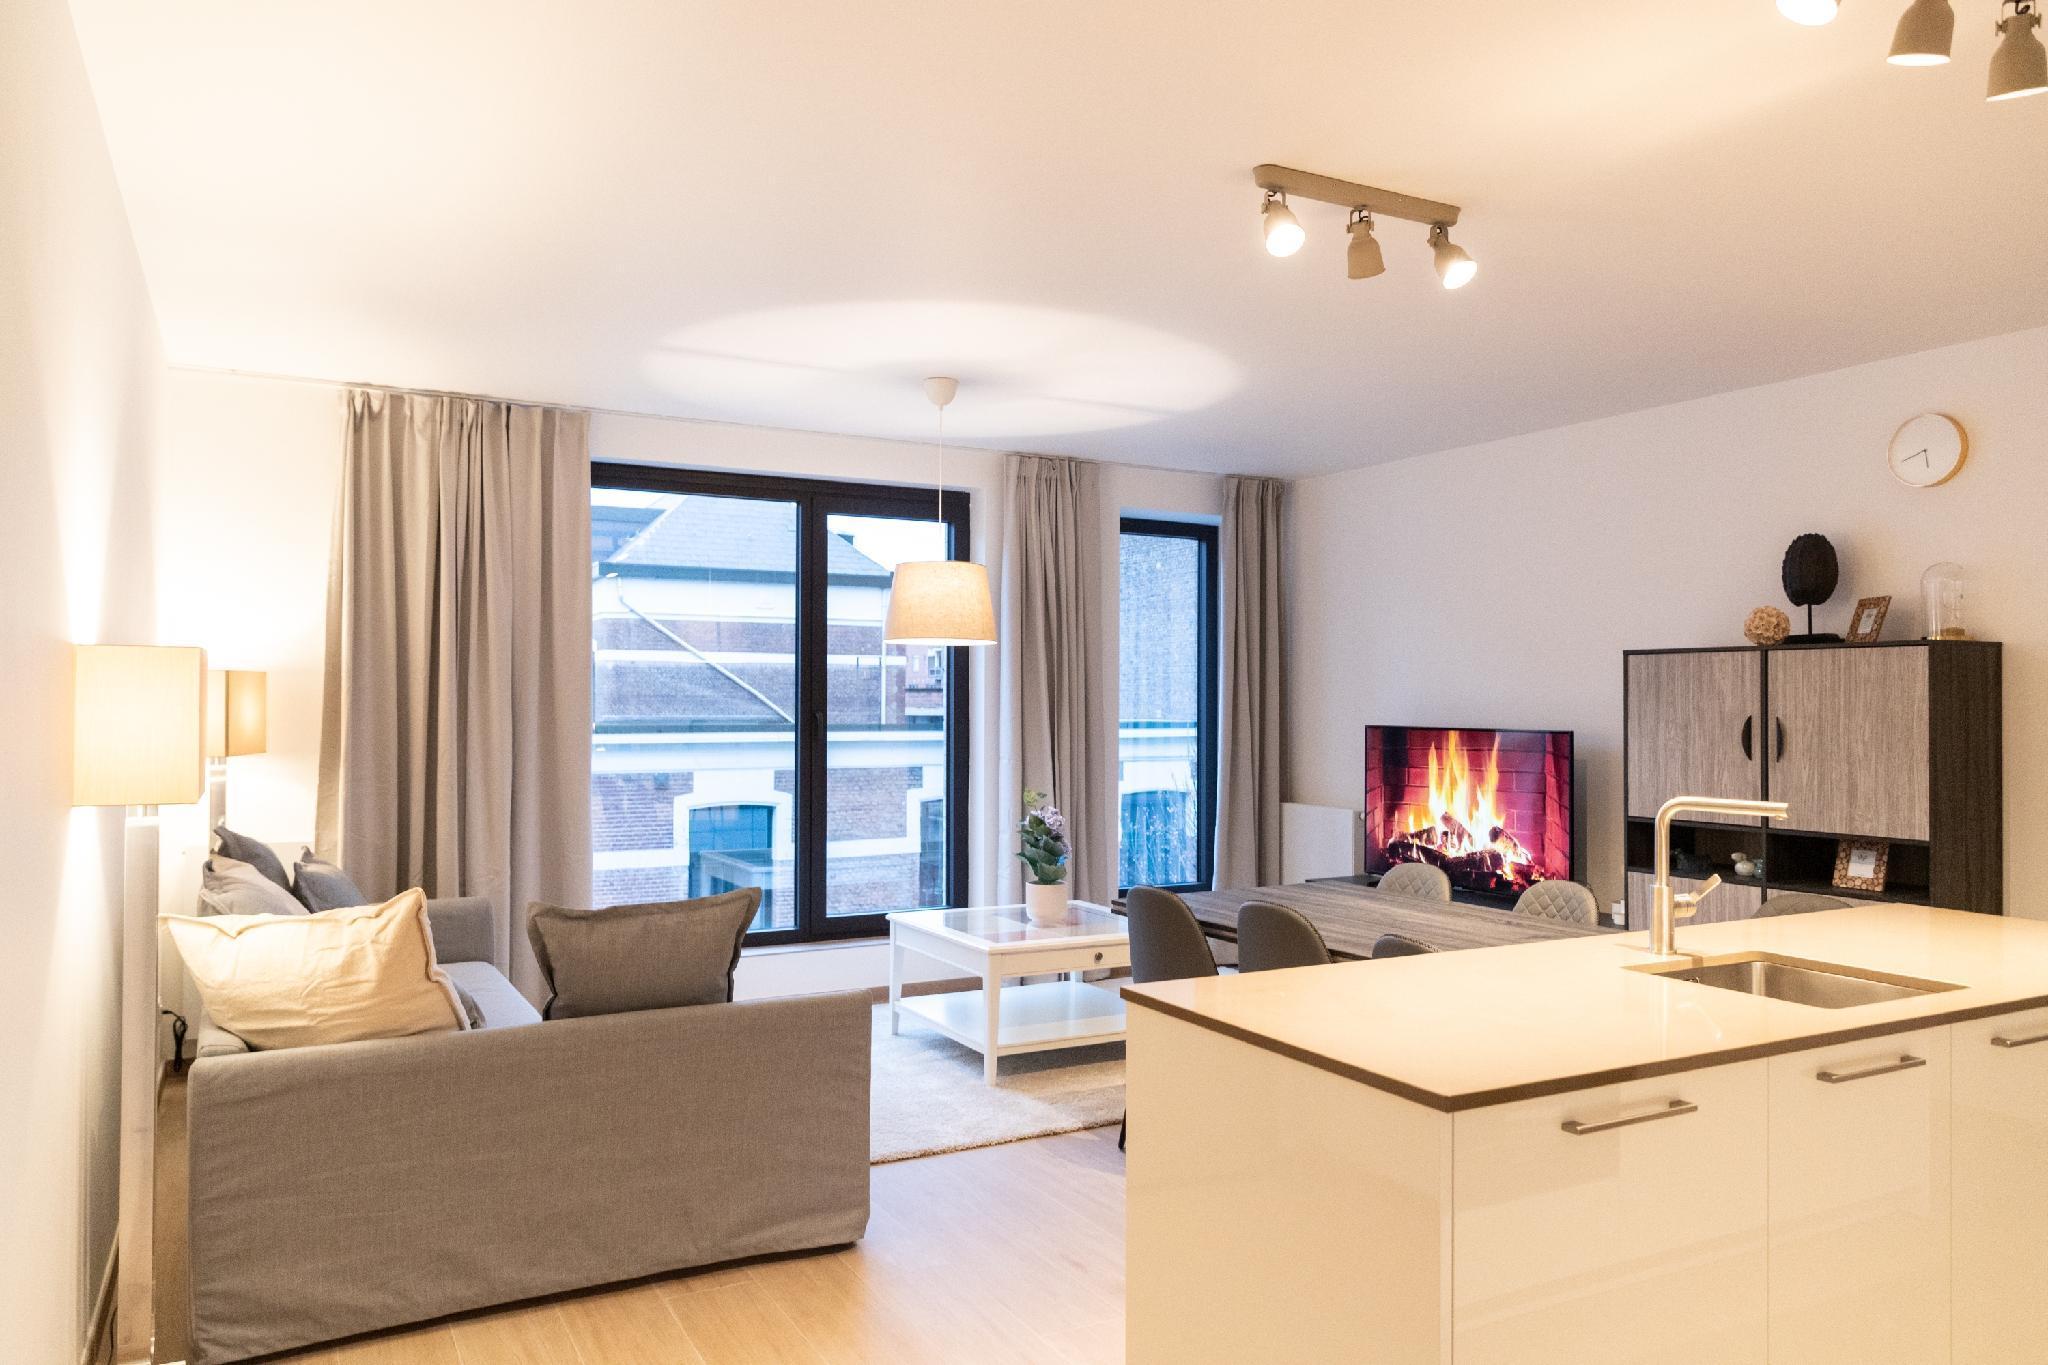 Furnished Flats Near Antwerp City Center